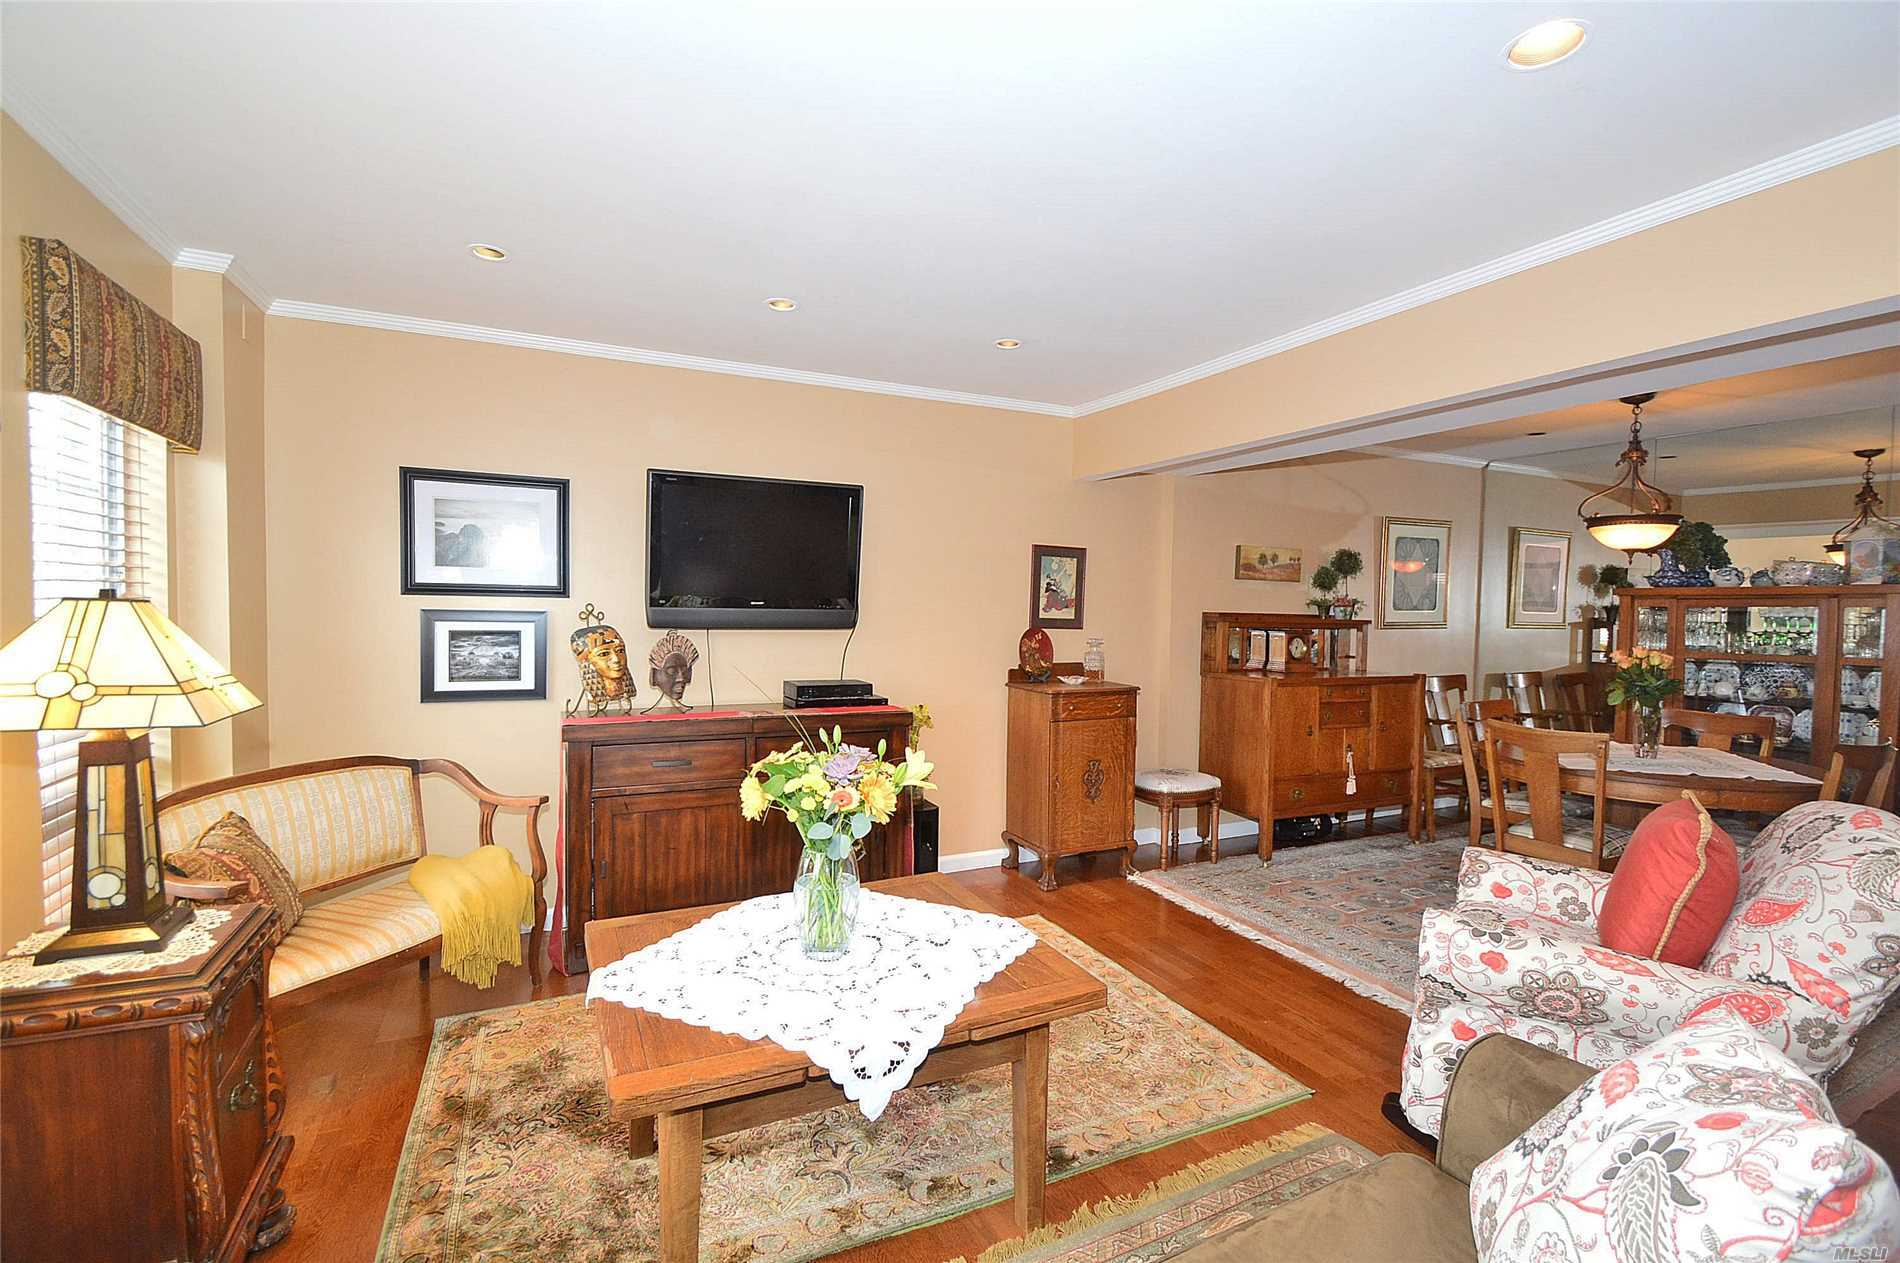 Property for sale at 115 Woodlake Dr, Woodbury,  NY 11797